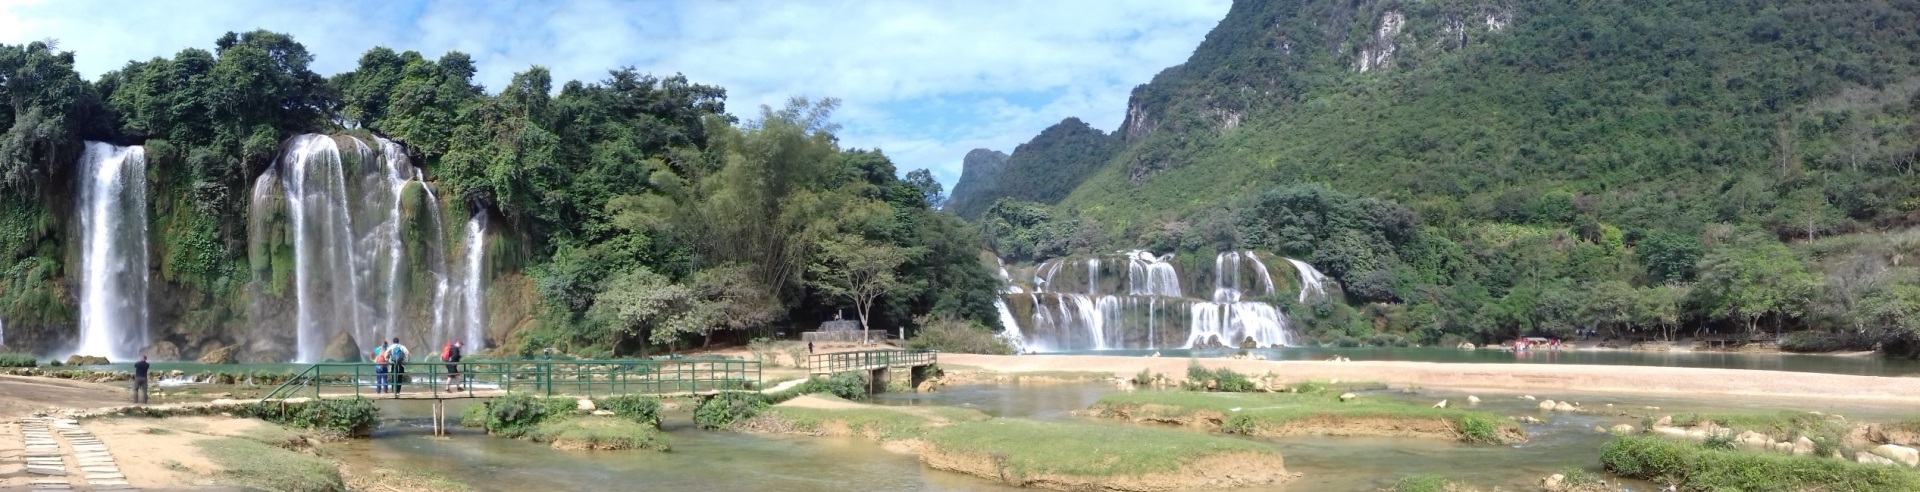 Visiter Ban Gioc - Vietnam